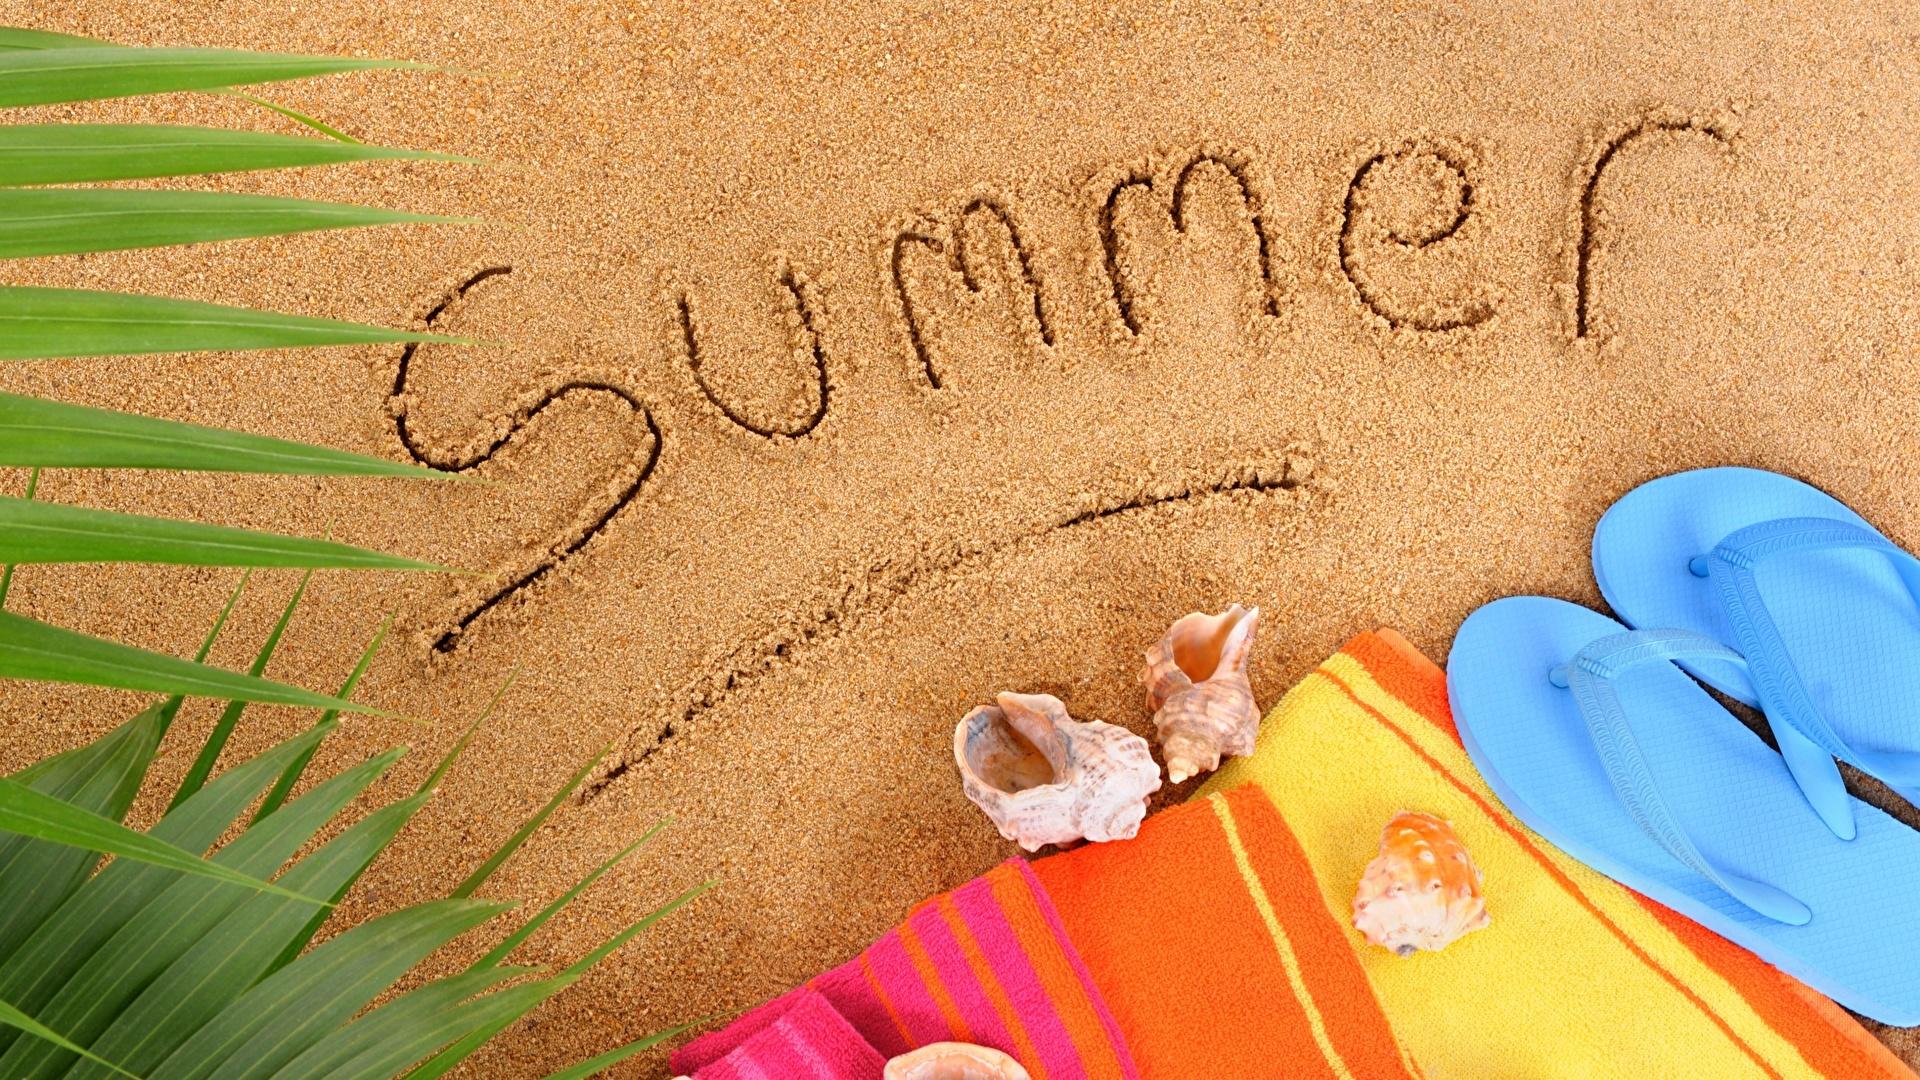 Summer free background